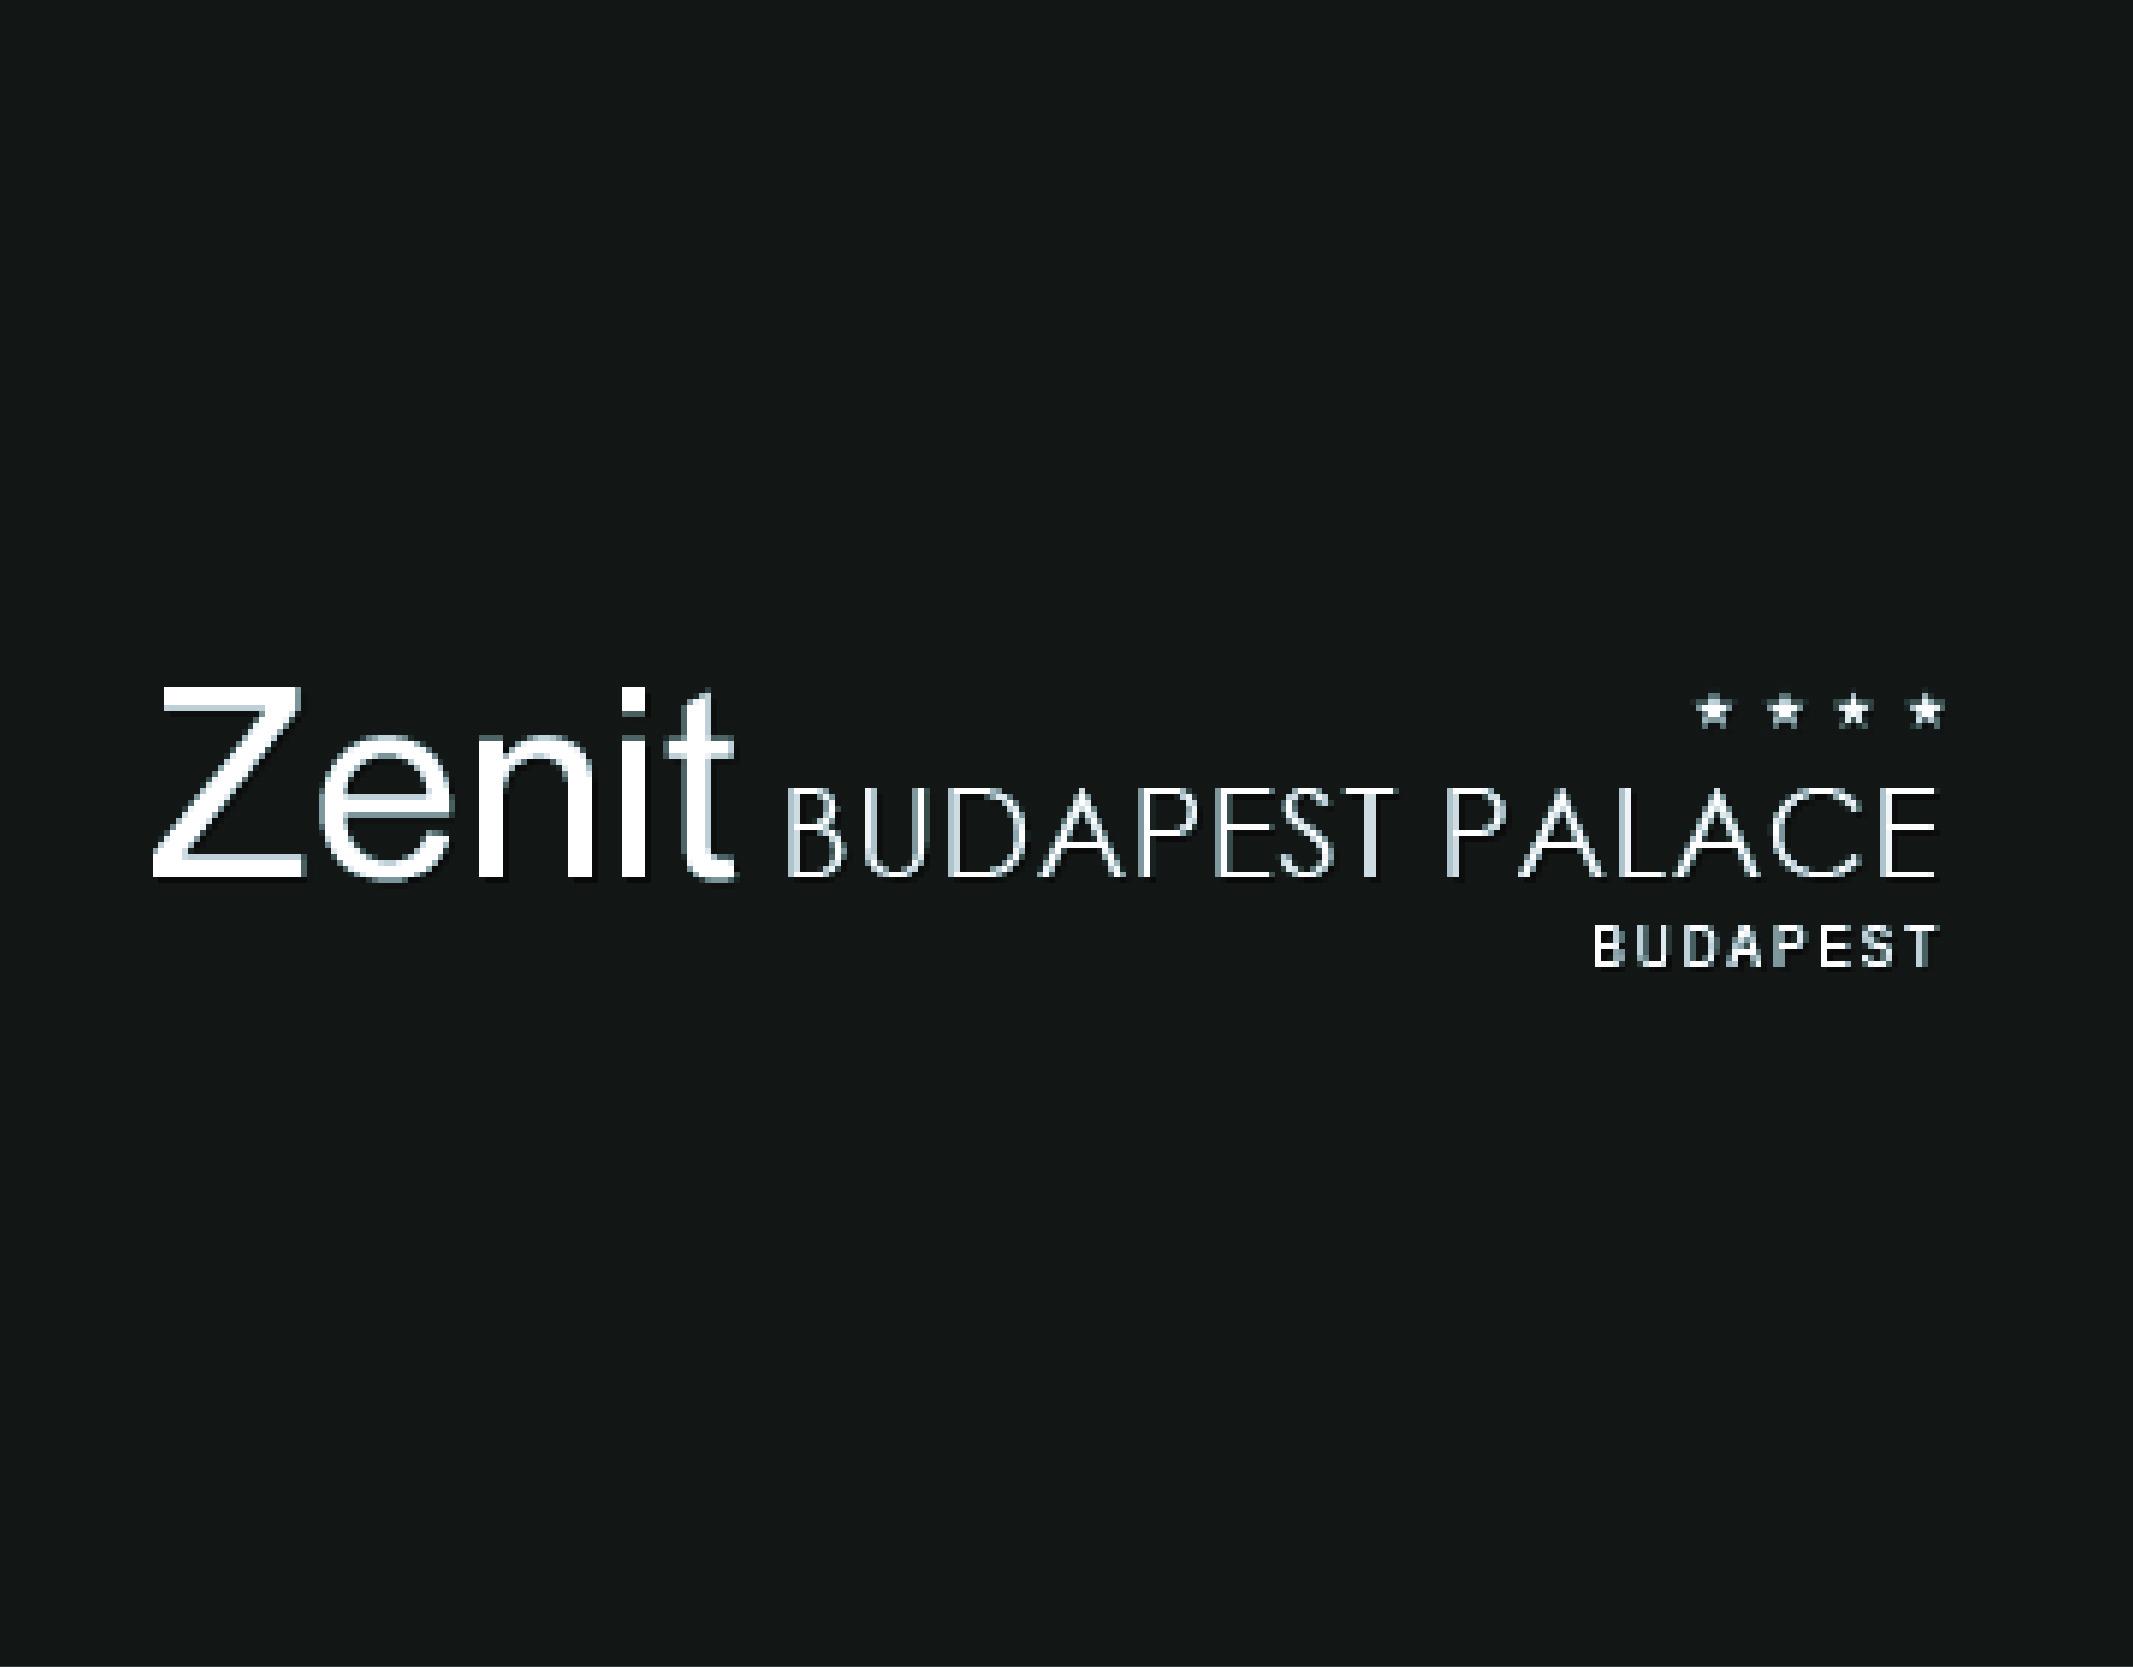 Zenit Budapest Palace Hotel